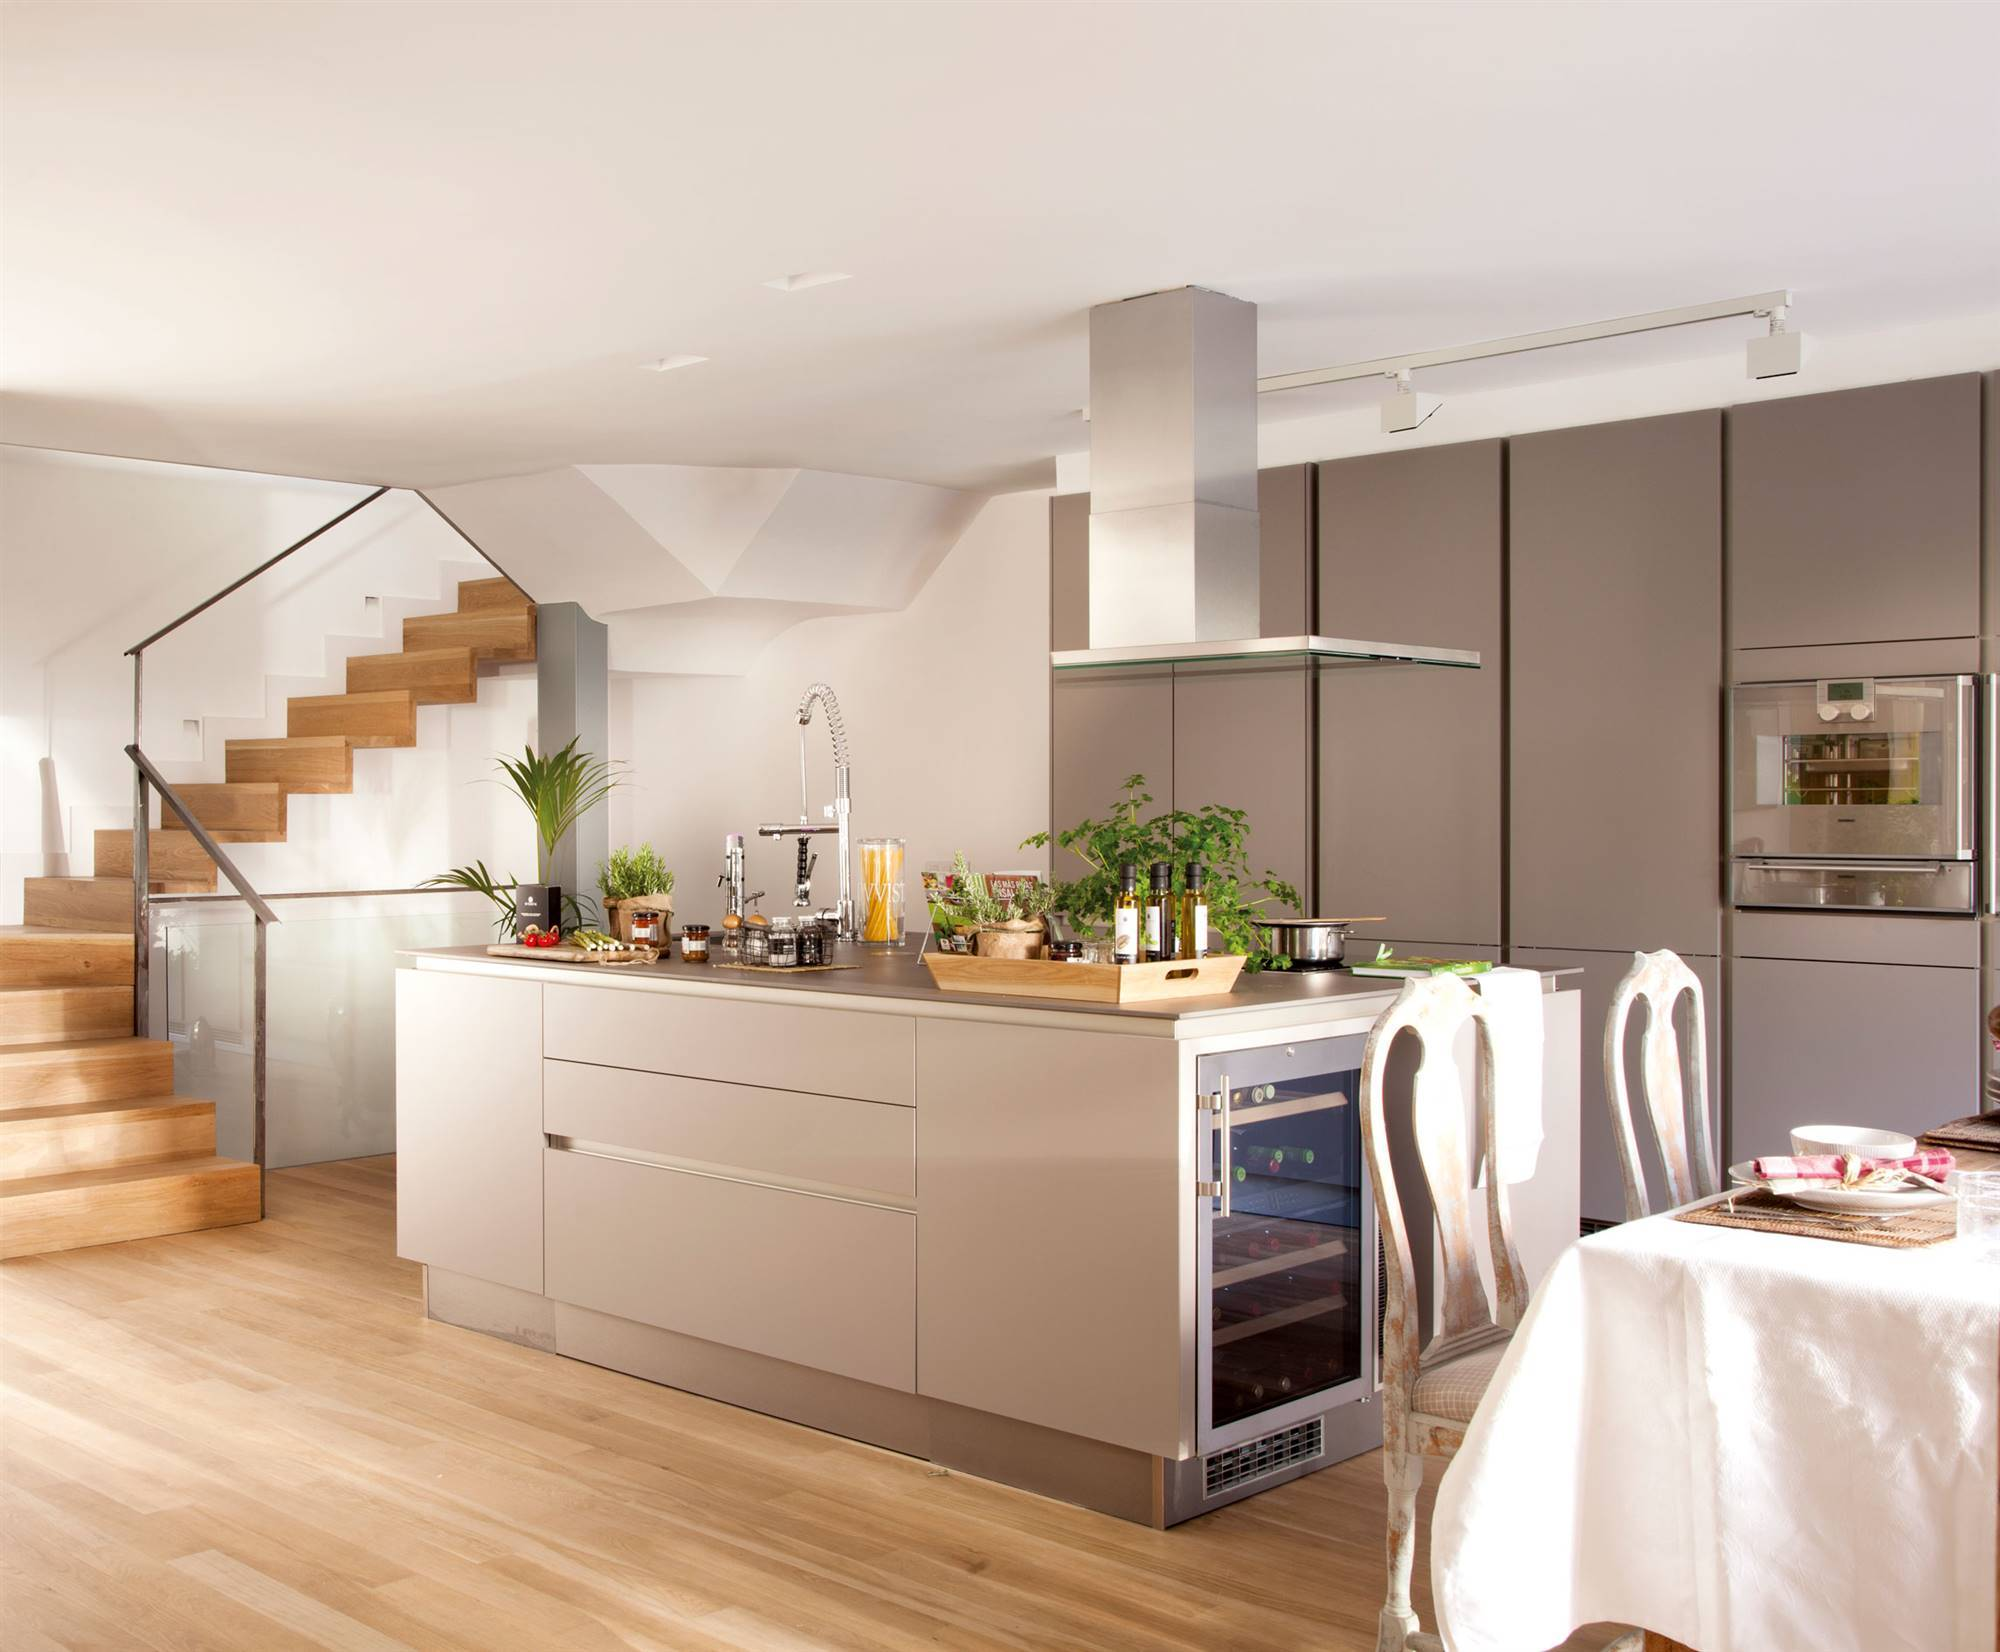 Ver fotos de cocinas modernas inspire design program - Ver cocinas ...